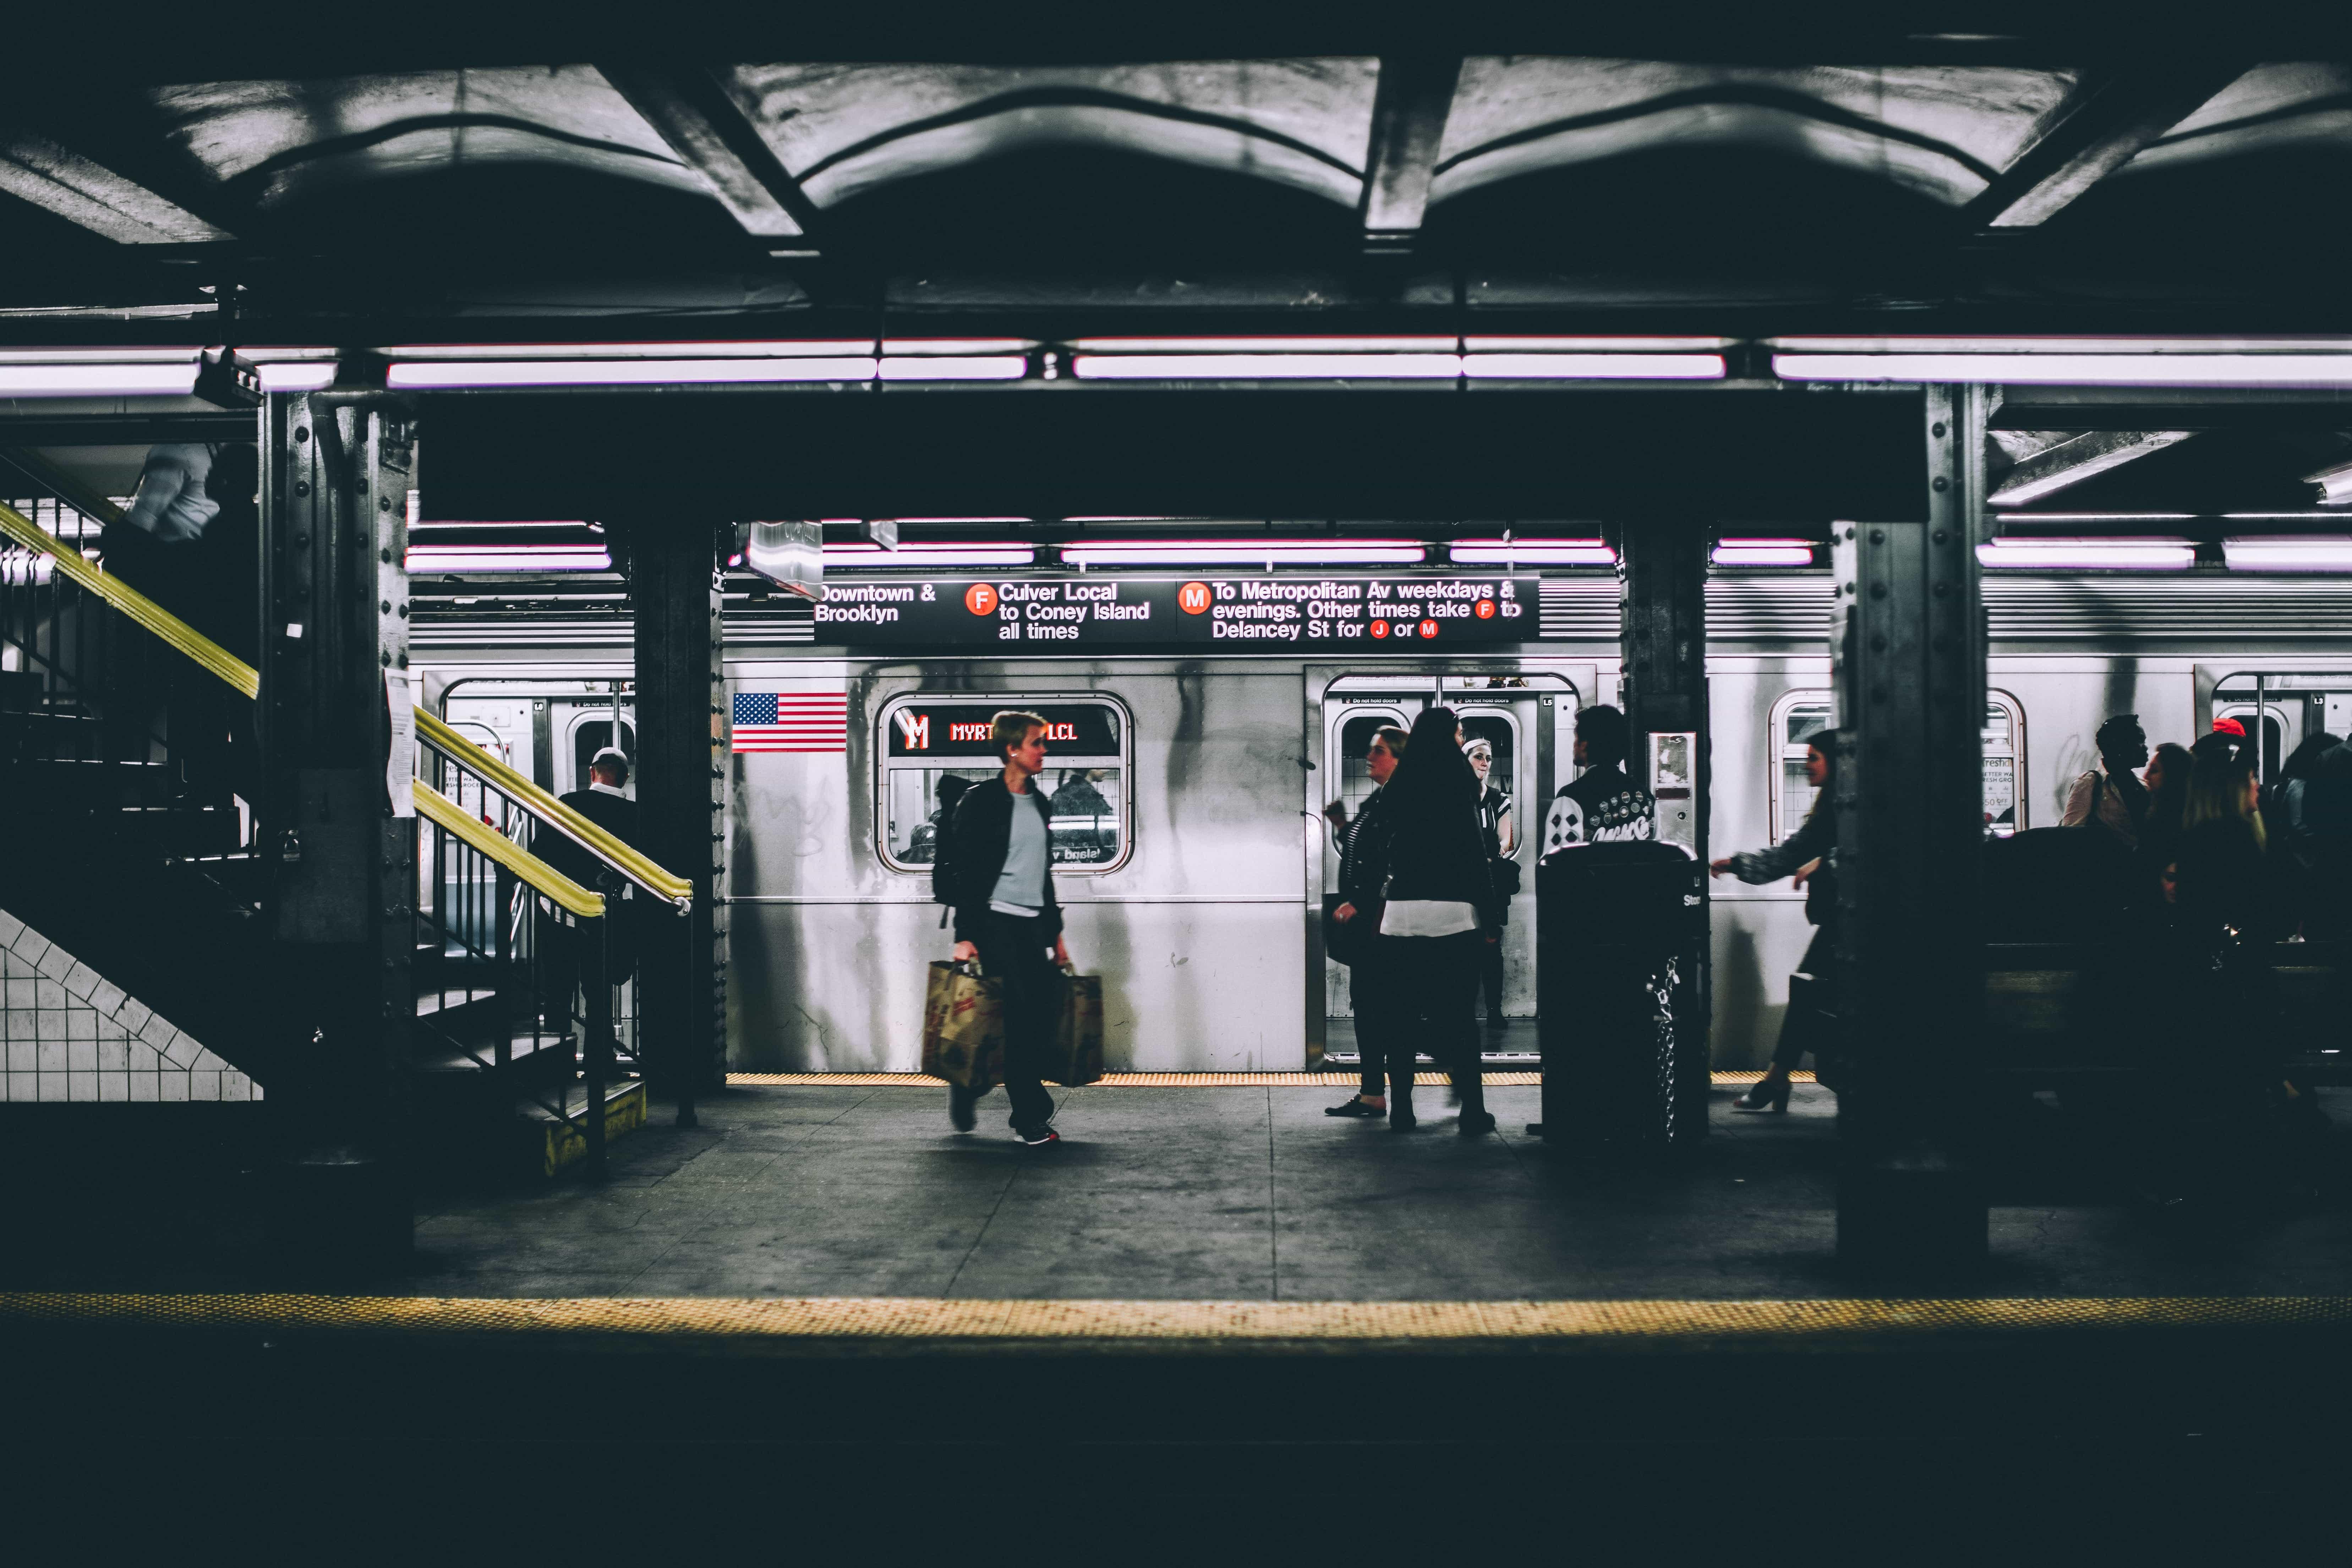 new york city subway nyc subway app fromlusttilldawn.com lust till dawn